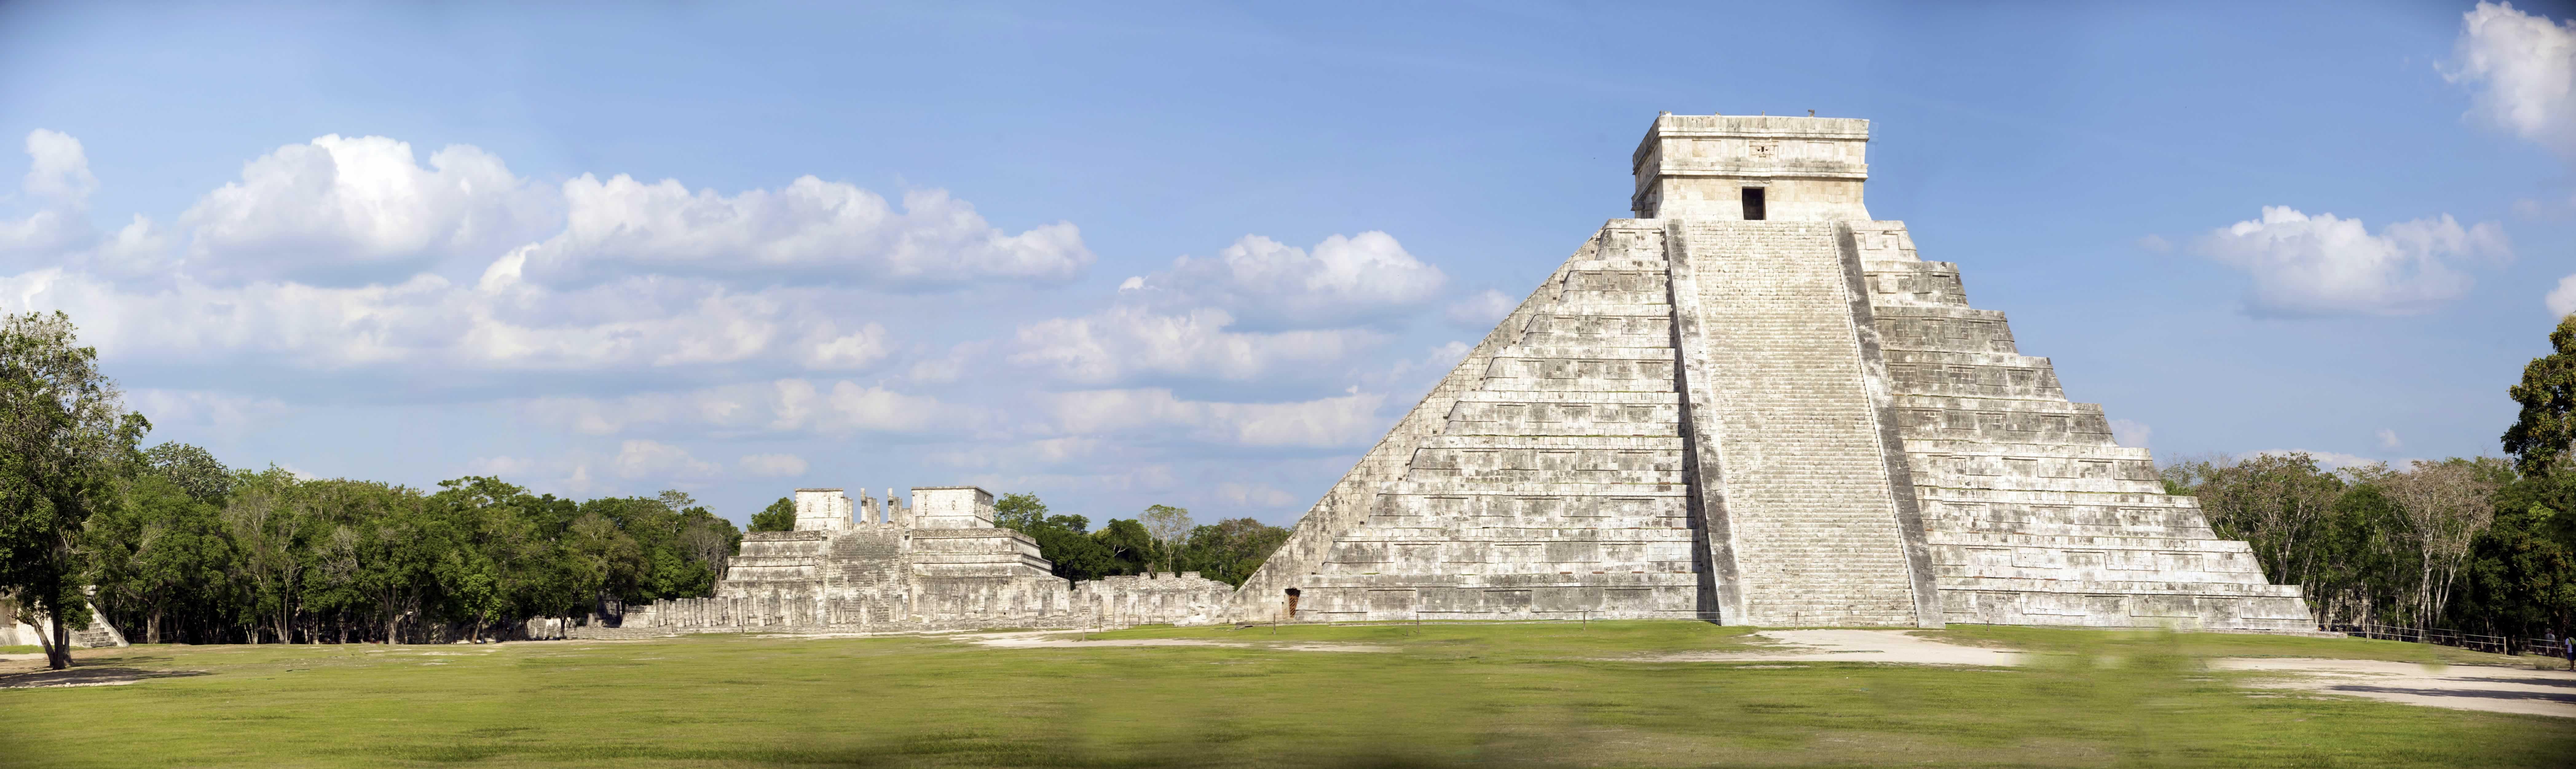 Xichen, tours por el mundo maya Chichén Itzá